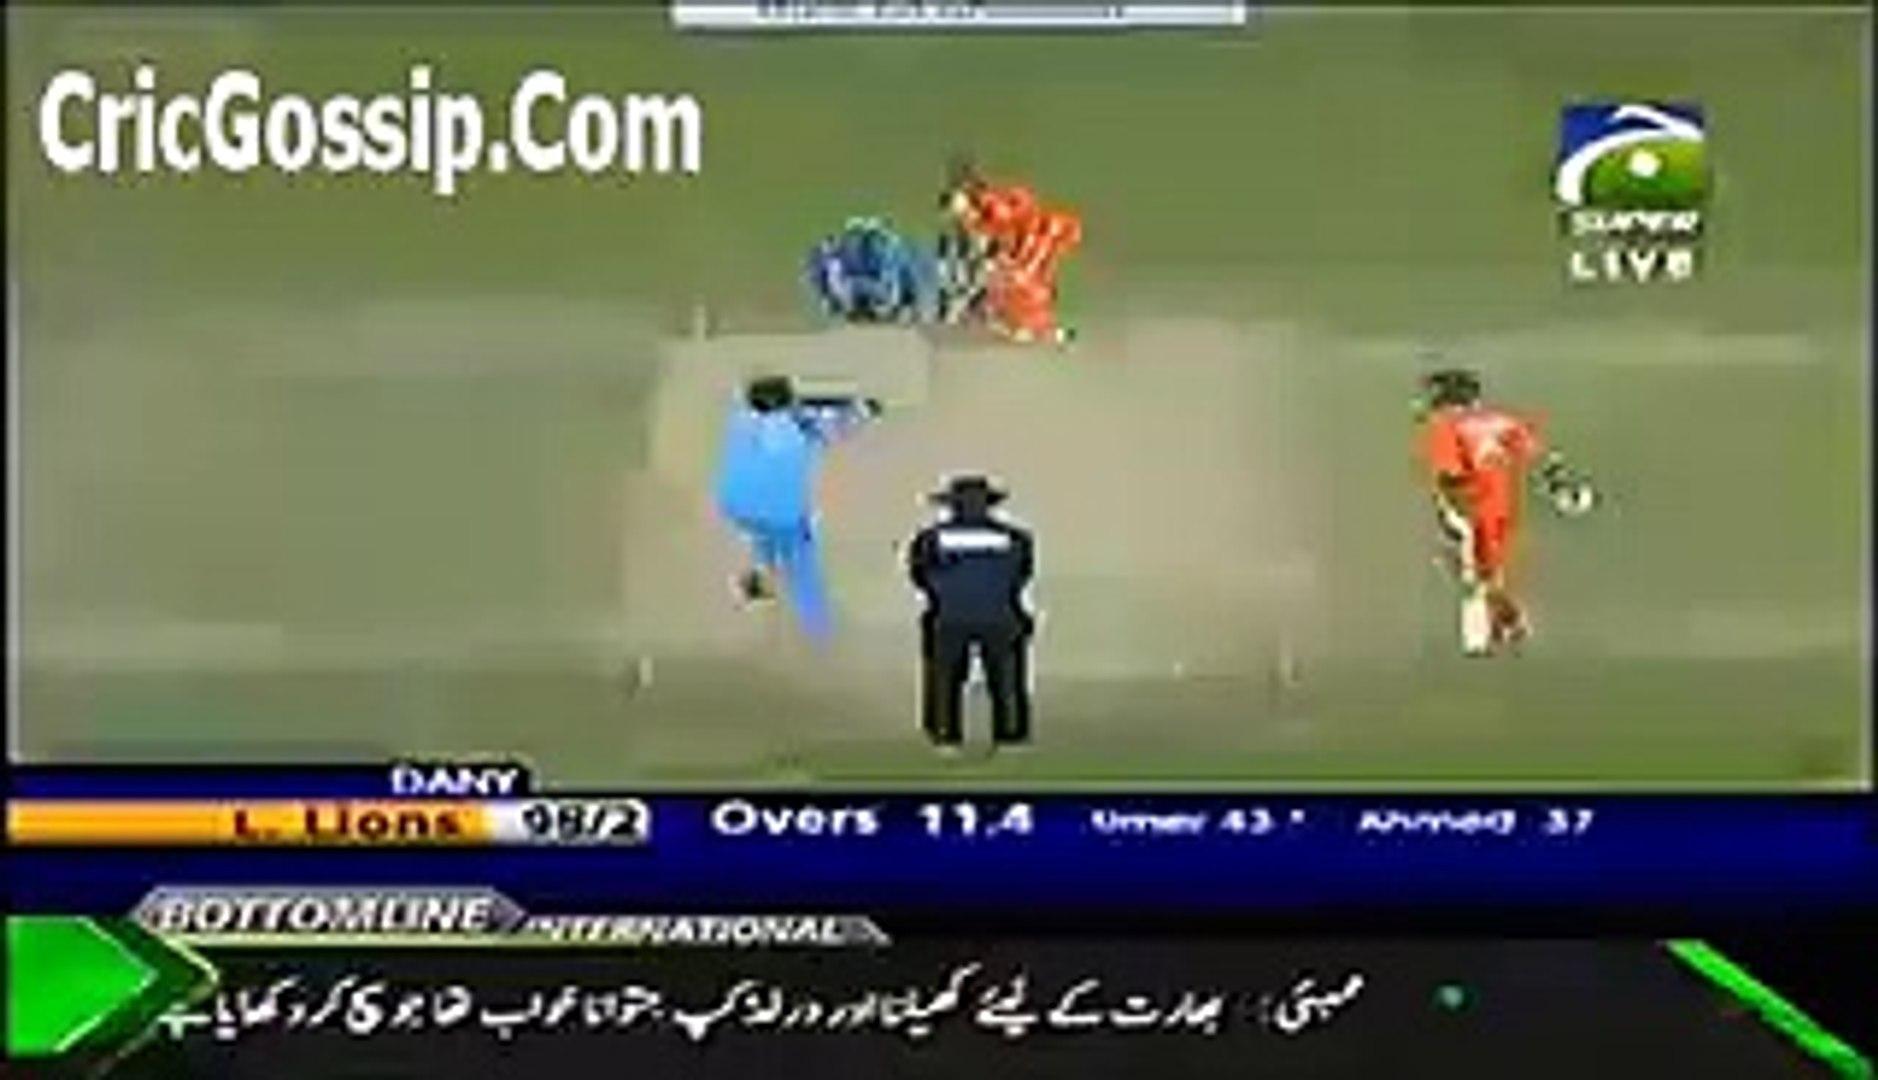 Danish Kaneria Magic Ball To Umar Akmal Clean Bowled Him Faysal Bank T20 2012